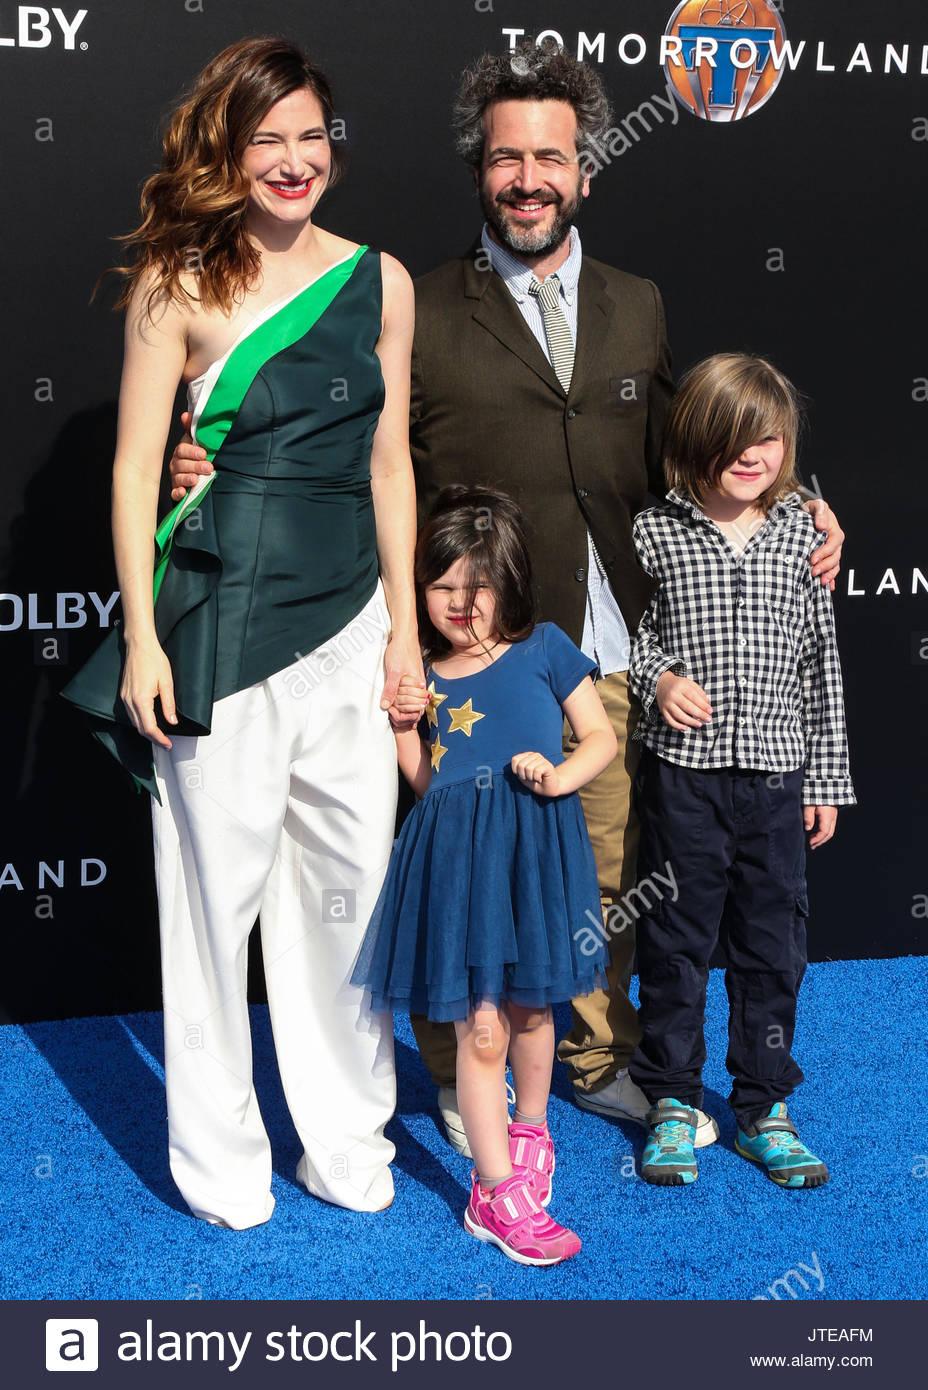 Ethan Sandler And Kathryn Hahn | www.pixshark.com - Images ...